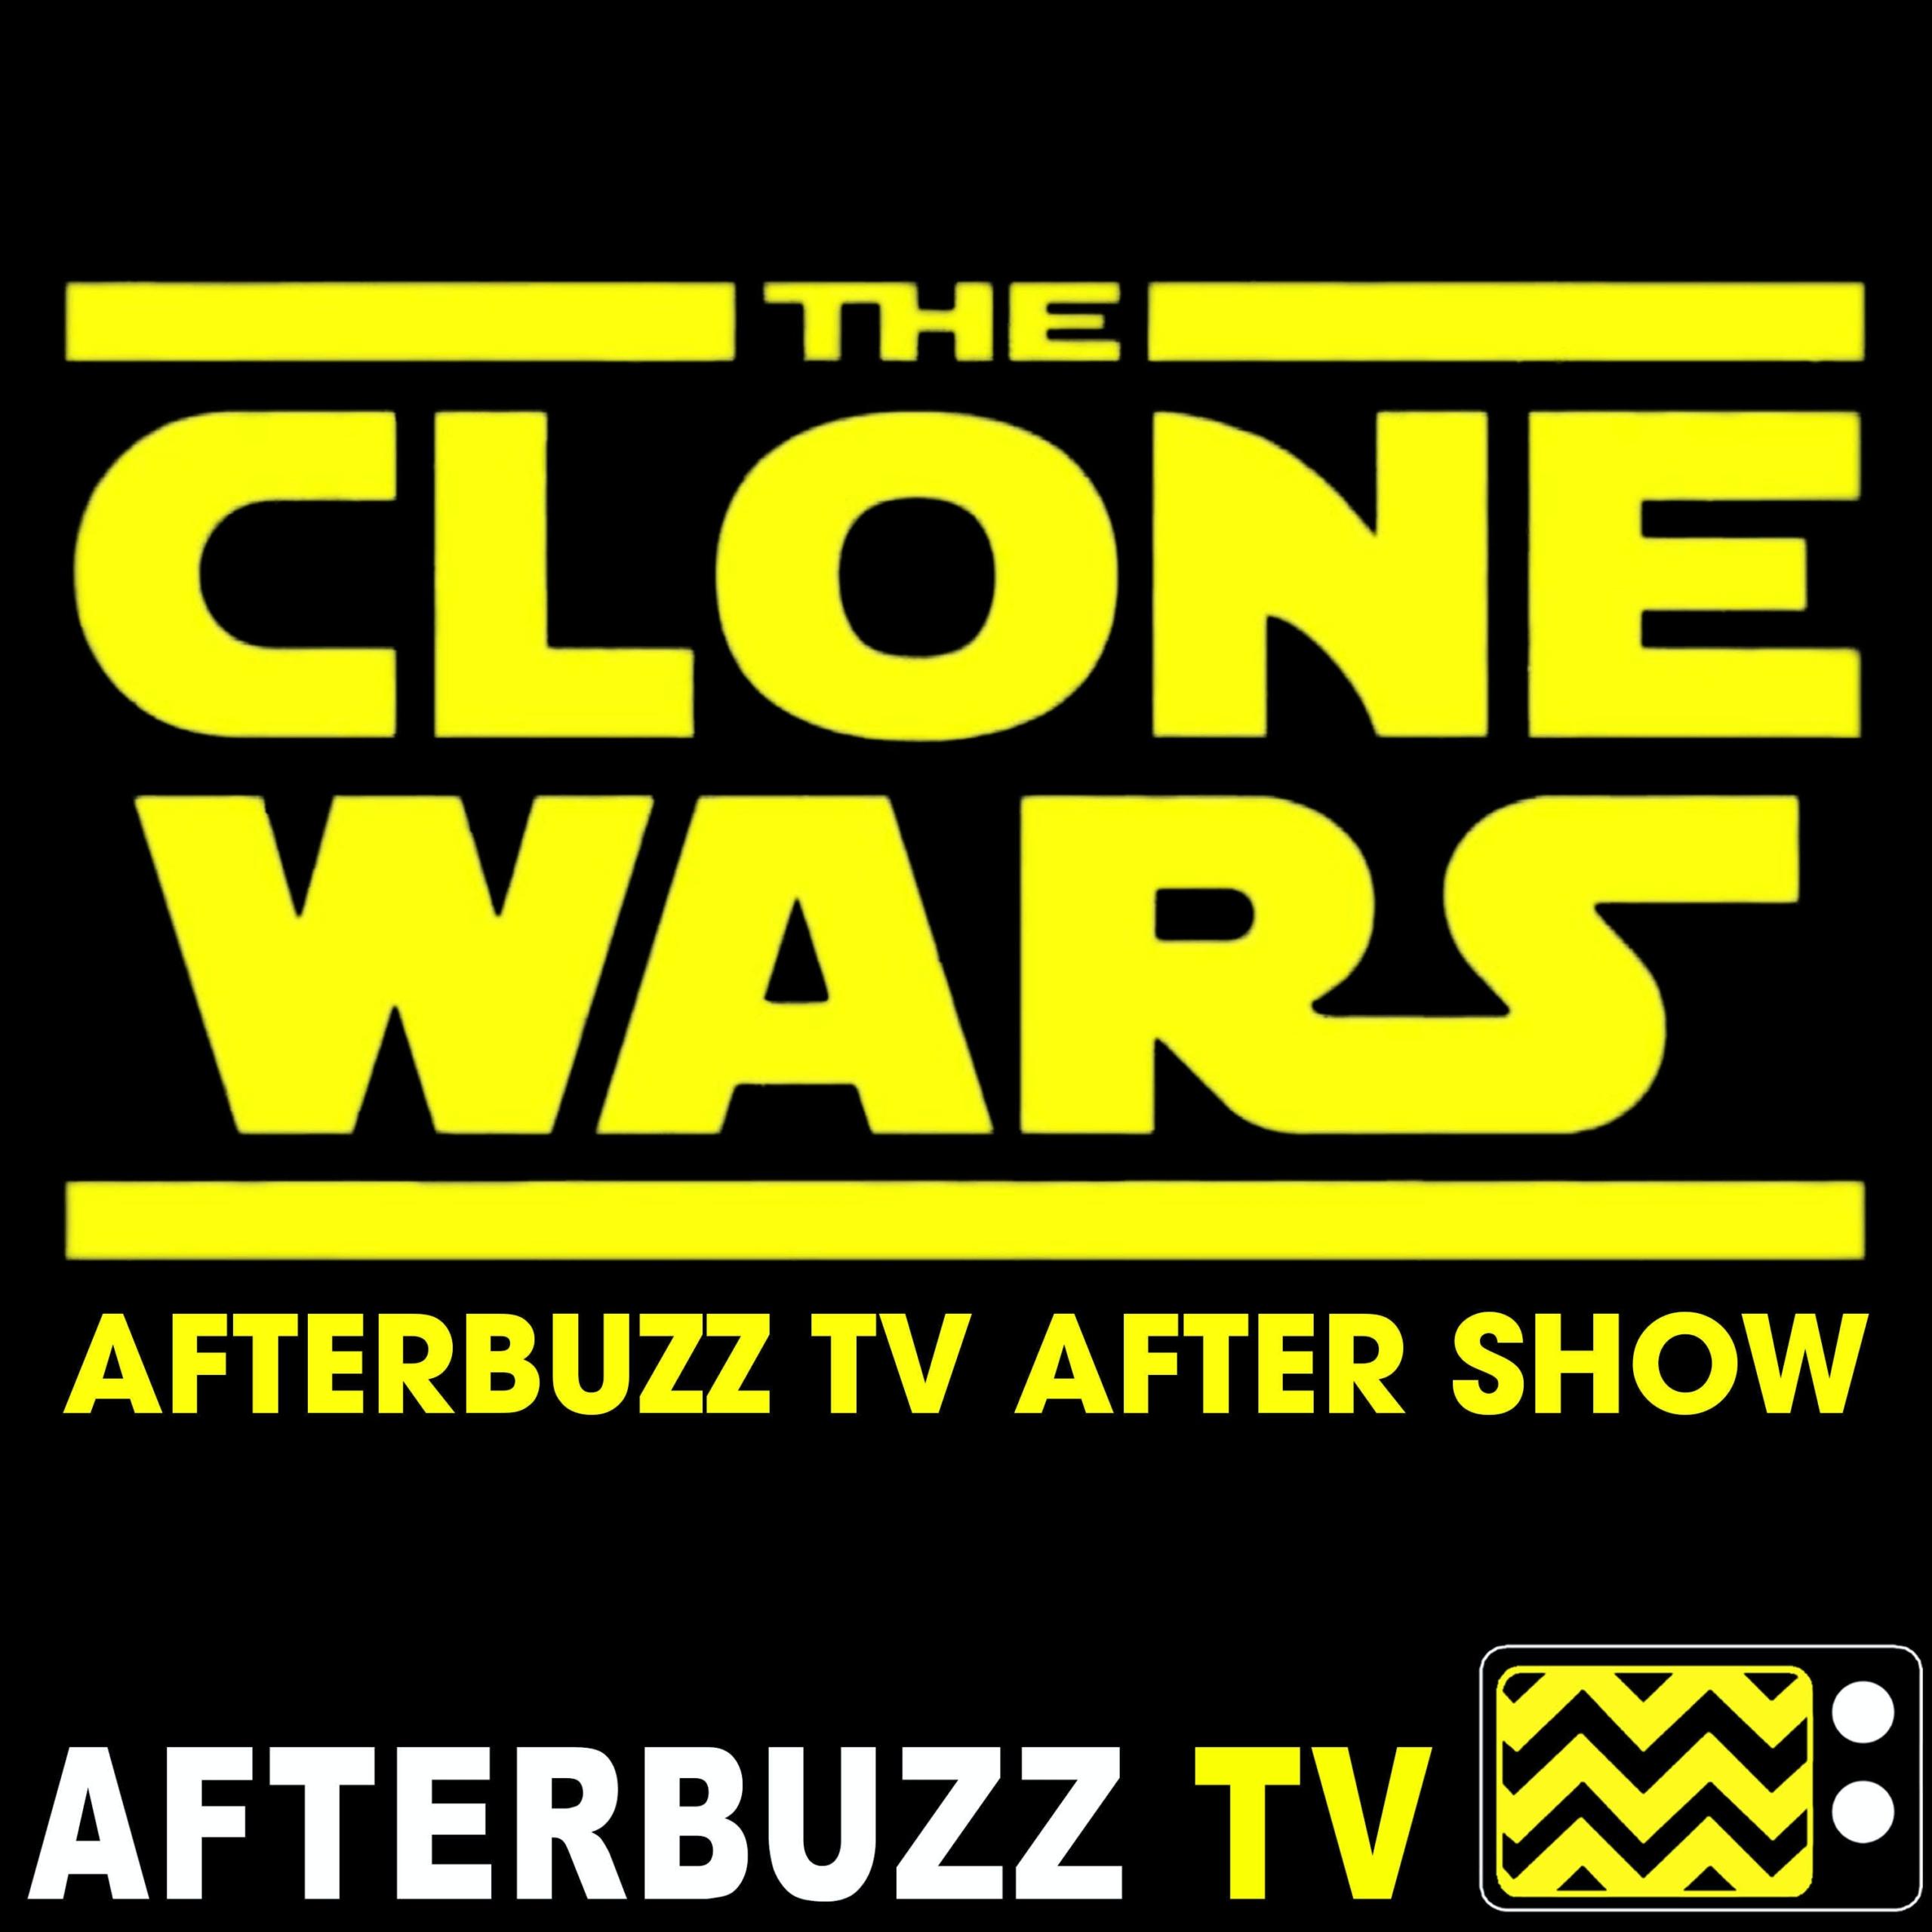 The Phantom Apprentice – S7 E10 'Star Wars: Clone Wars' After Show & Recap